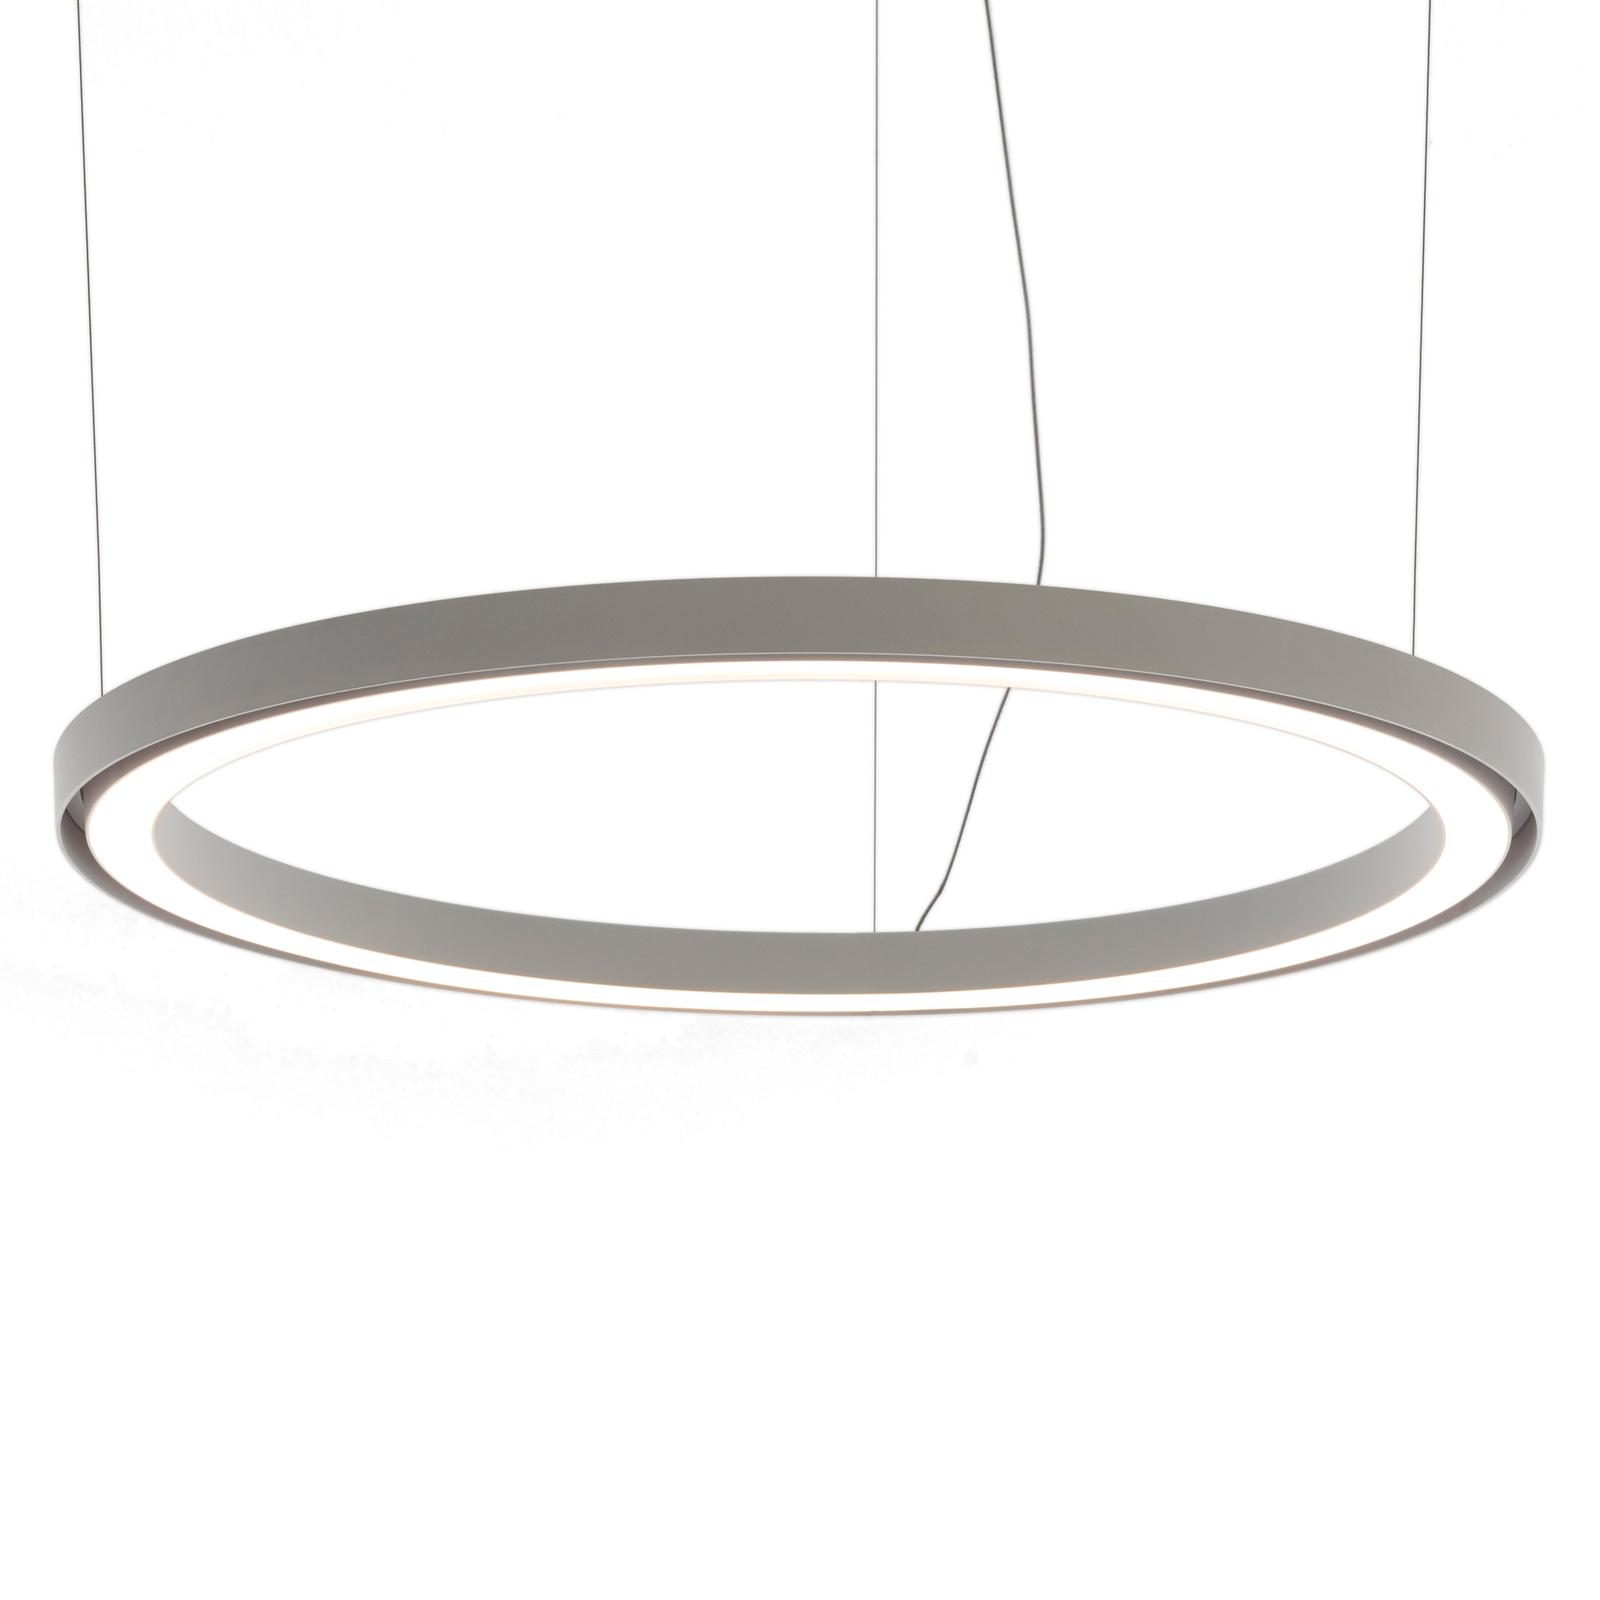 Artemide Ripple -LED-riippuvalo, sovellus, Ø 90 cm